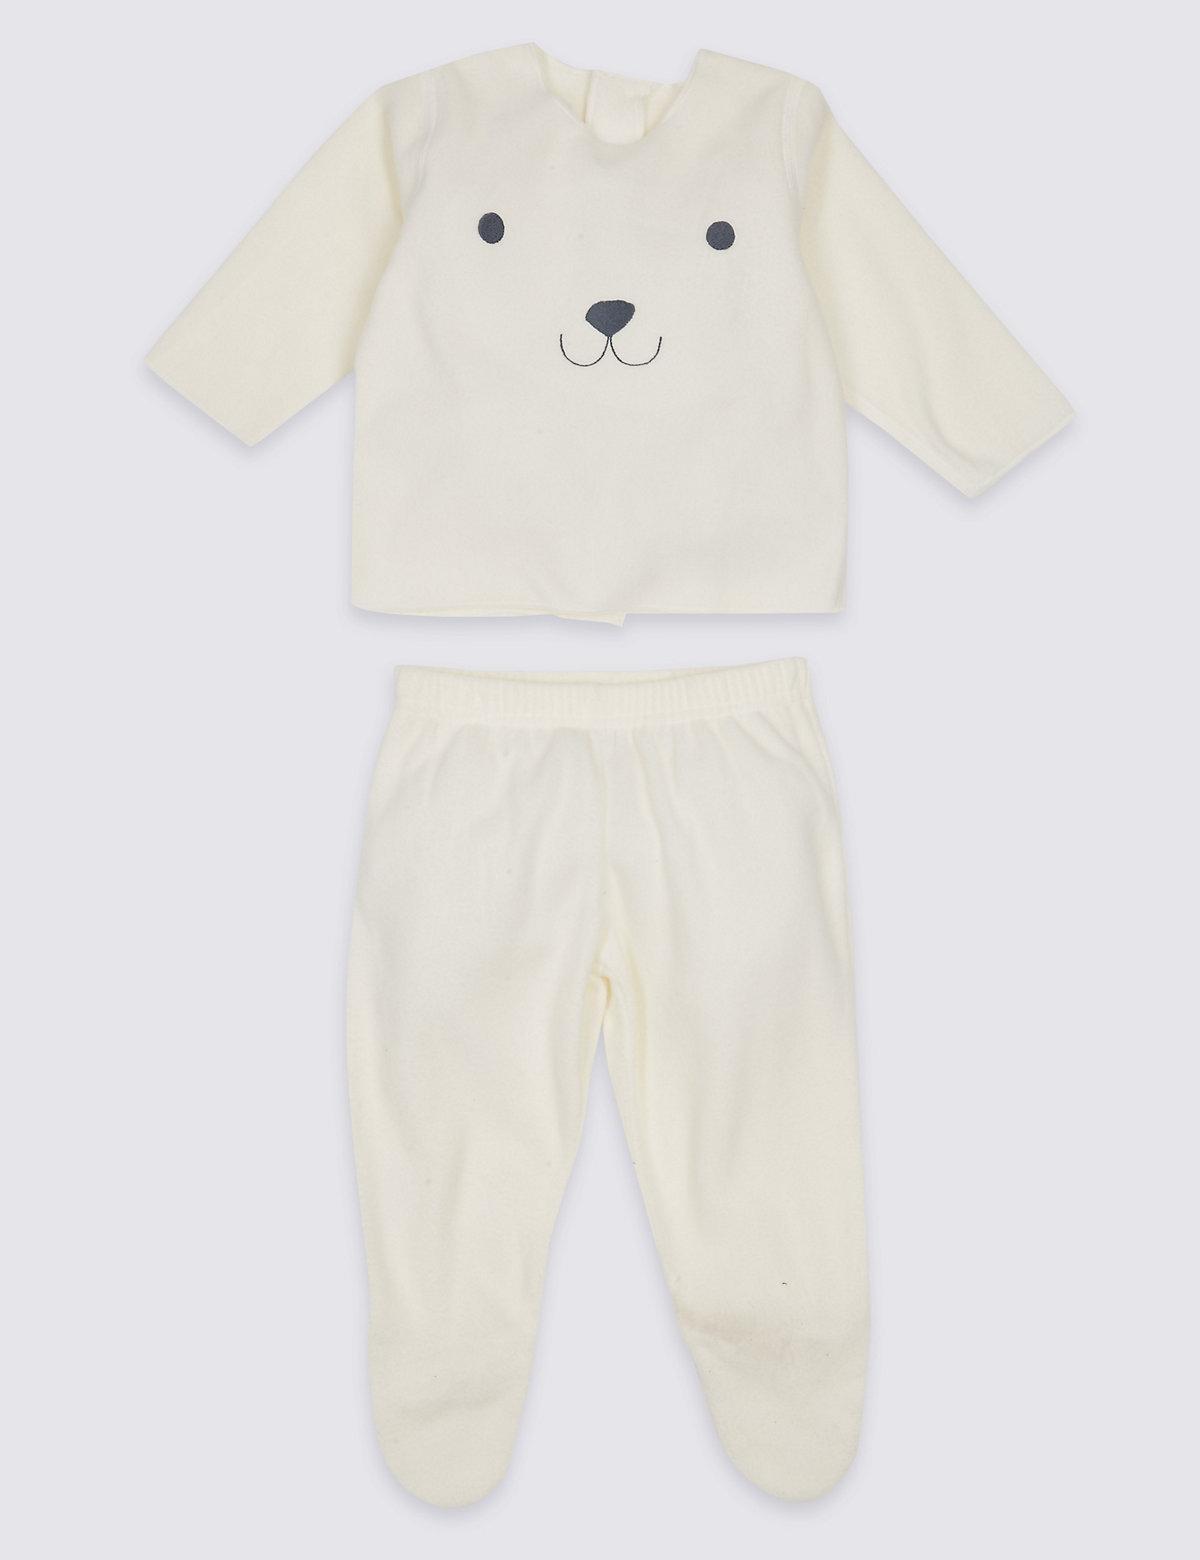 2 Piece Bear Top & Bottom Outfit